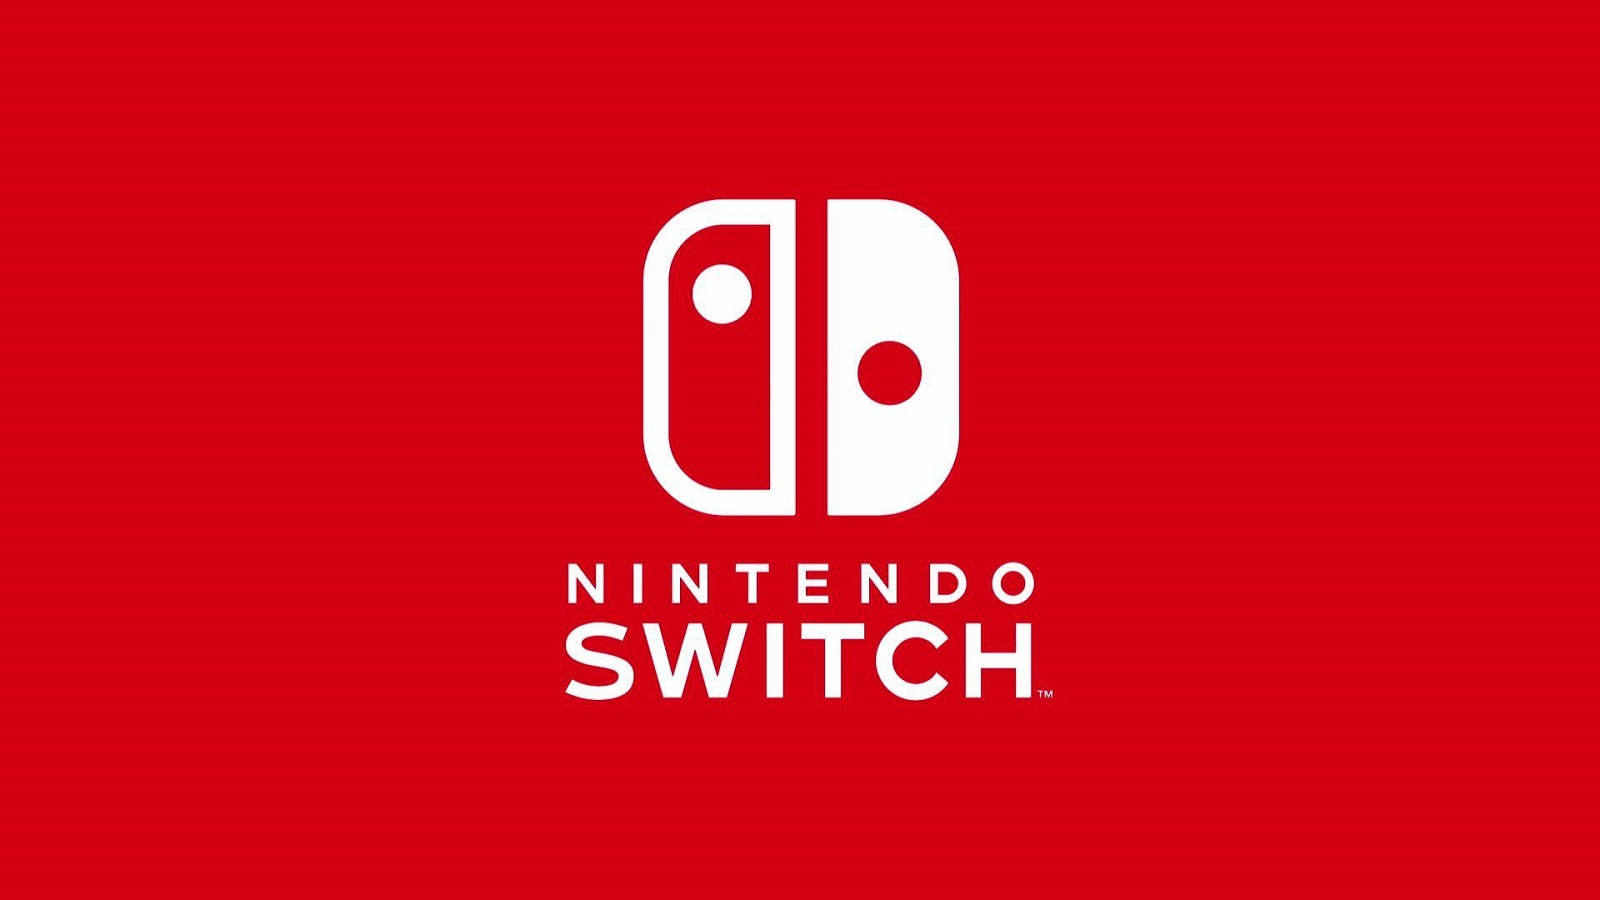 Следующая мини-презентация игр для Switch от сторонних разработчиков пройдёт завтра